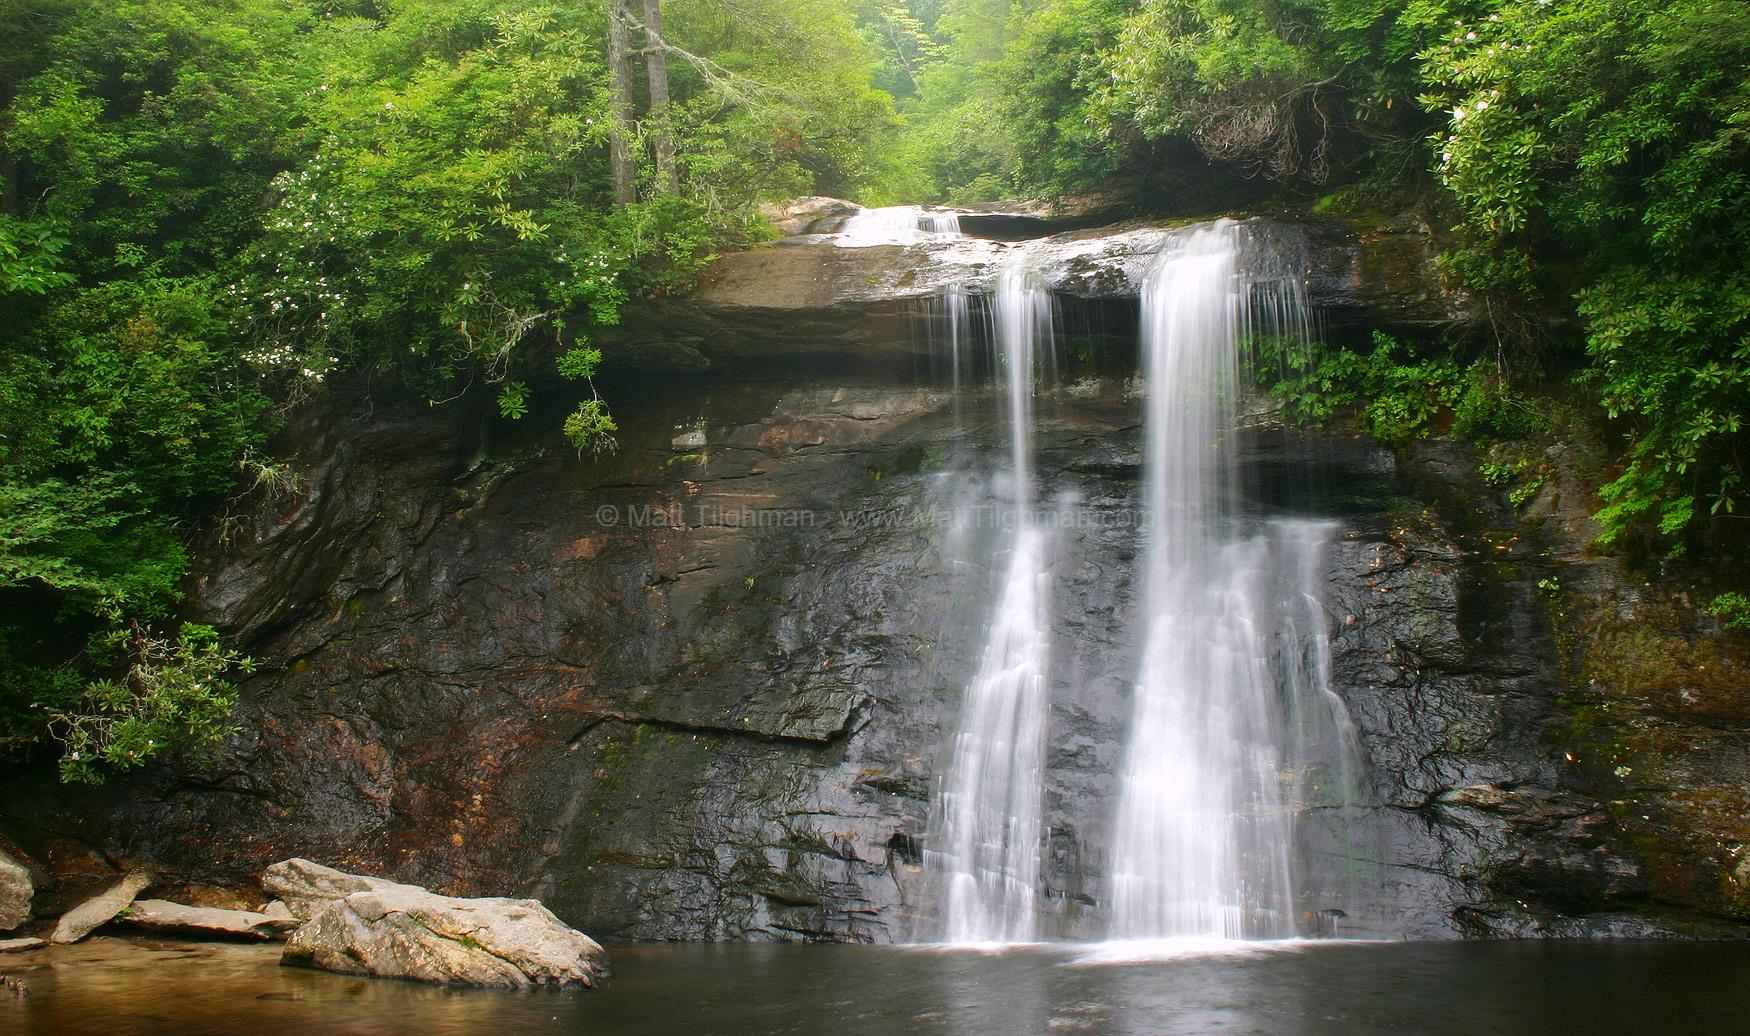 mountains waterfalls forest usa - photo #11